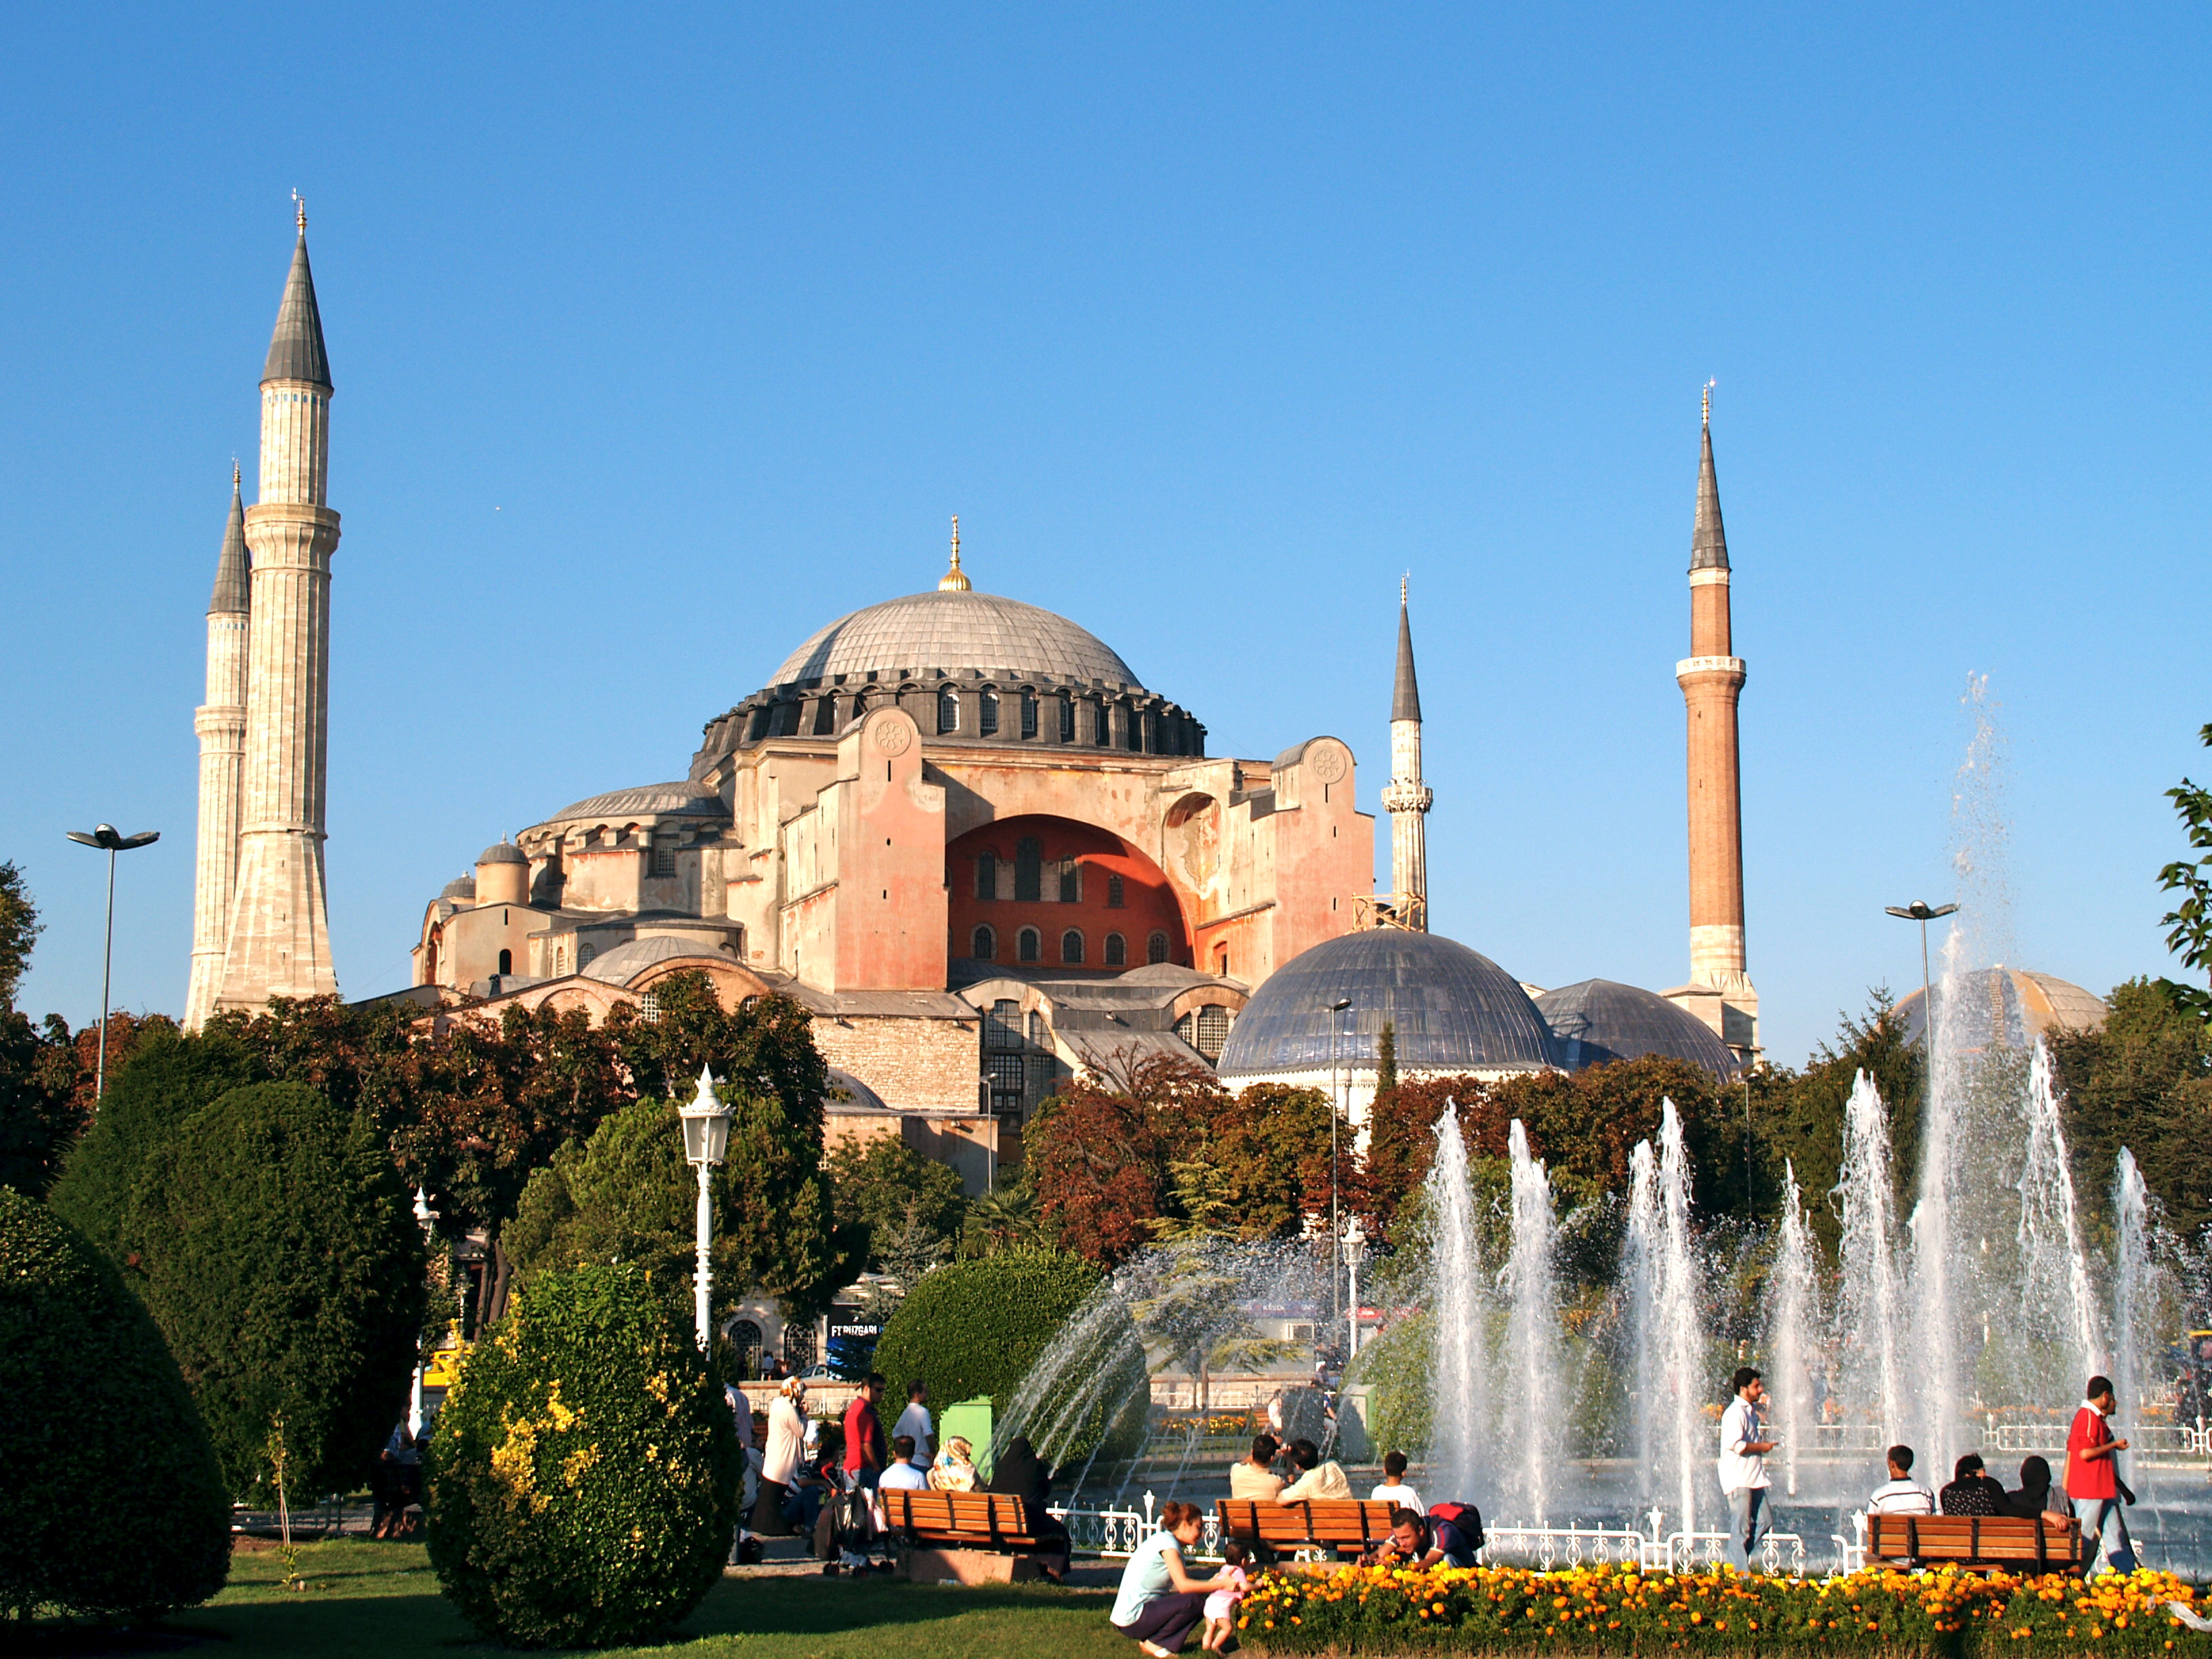 Ficheiro:Turkey, Istanbul, Hagia Sophia (Ayasofya) (3945434964).jpg